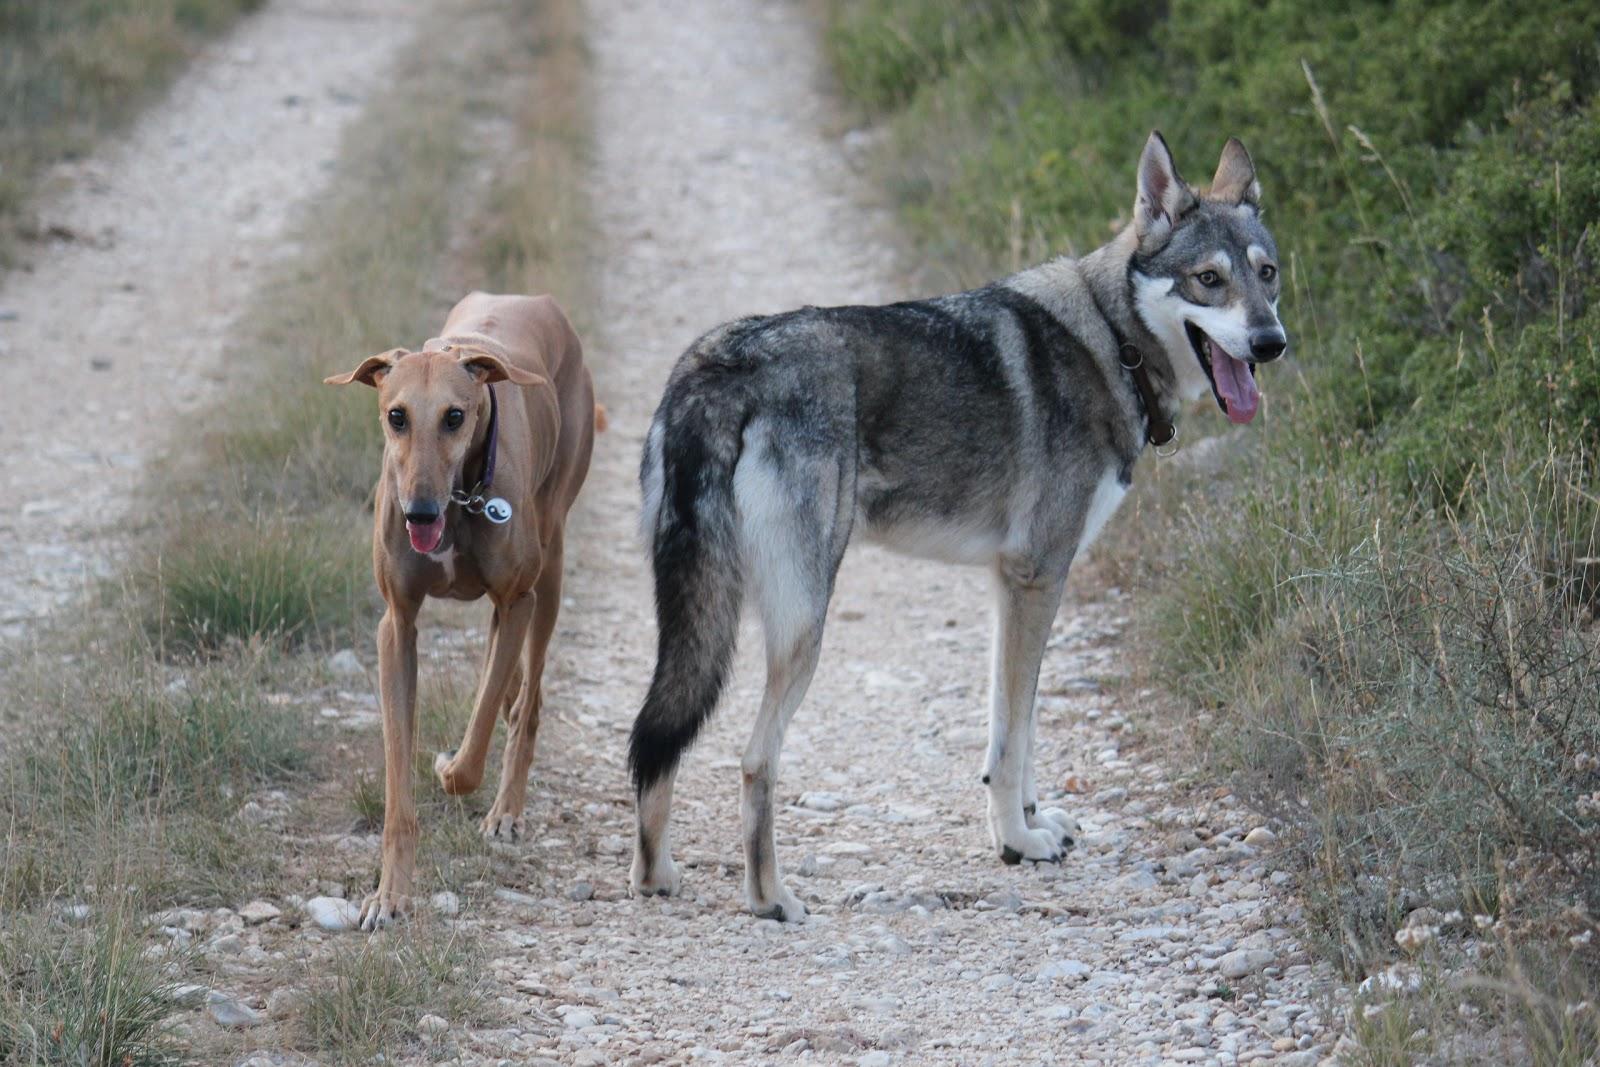 Chien rencontre chien